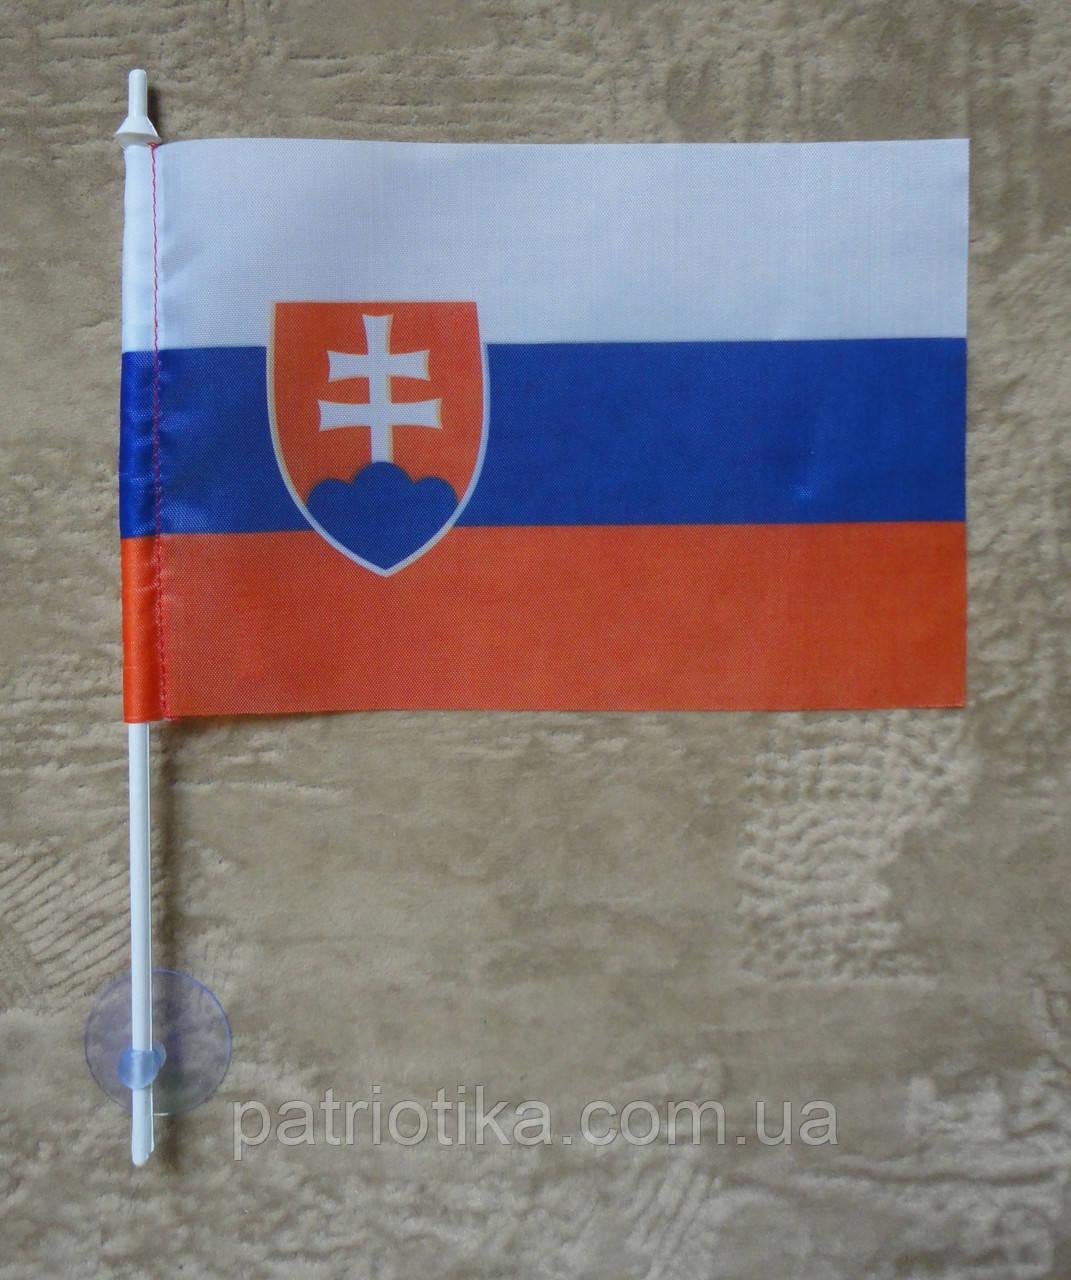 Флажок Словакии | Прапорець Словаччини 10х15 см полиэстер